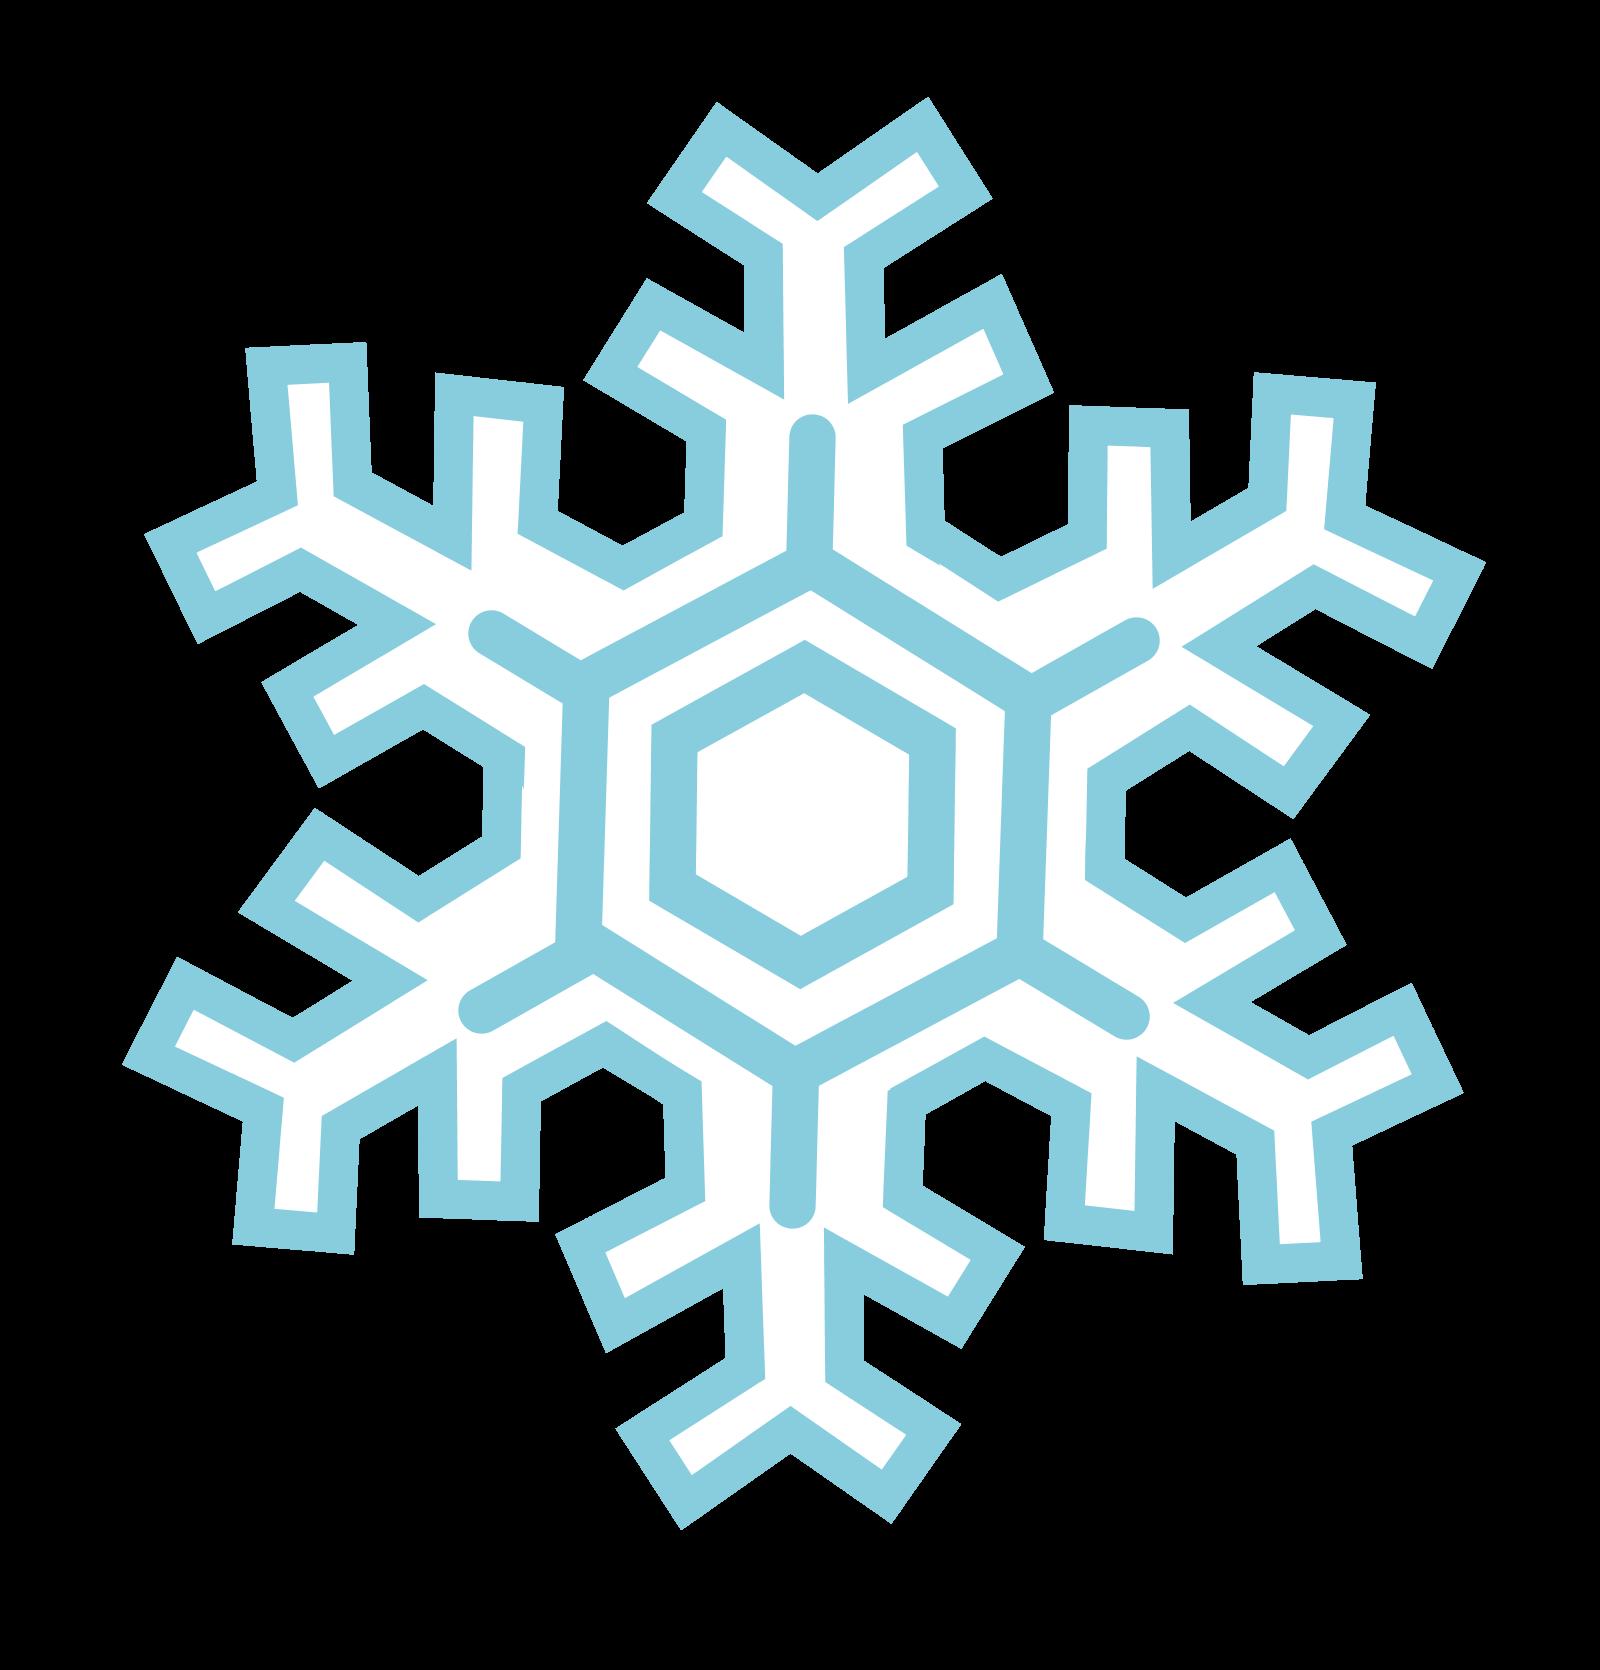 Frozen Snowflake PNG Image